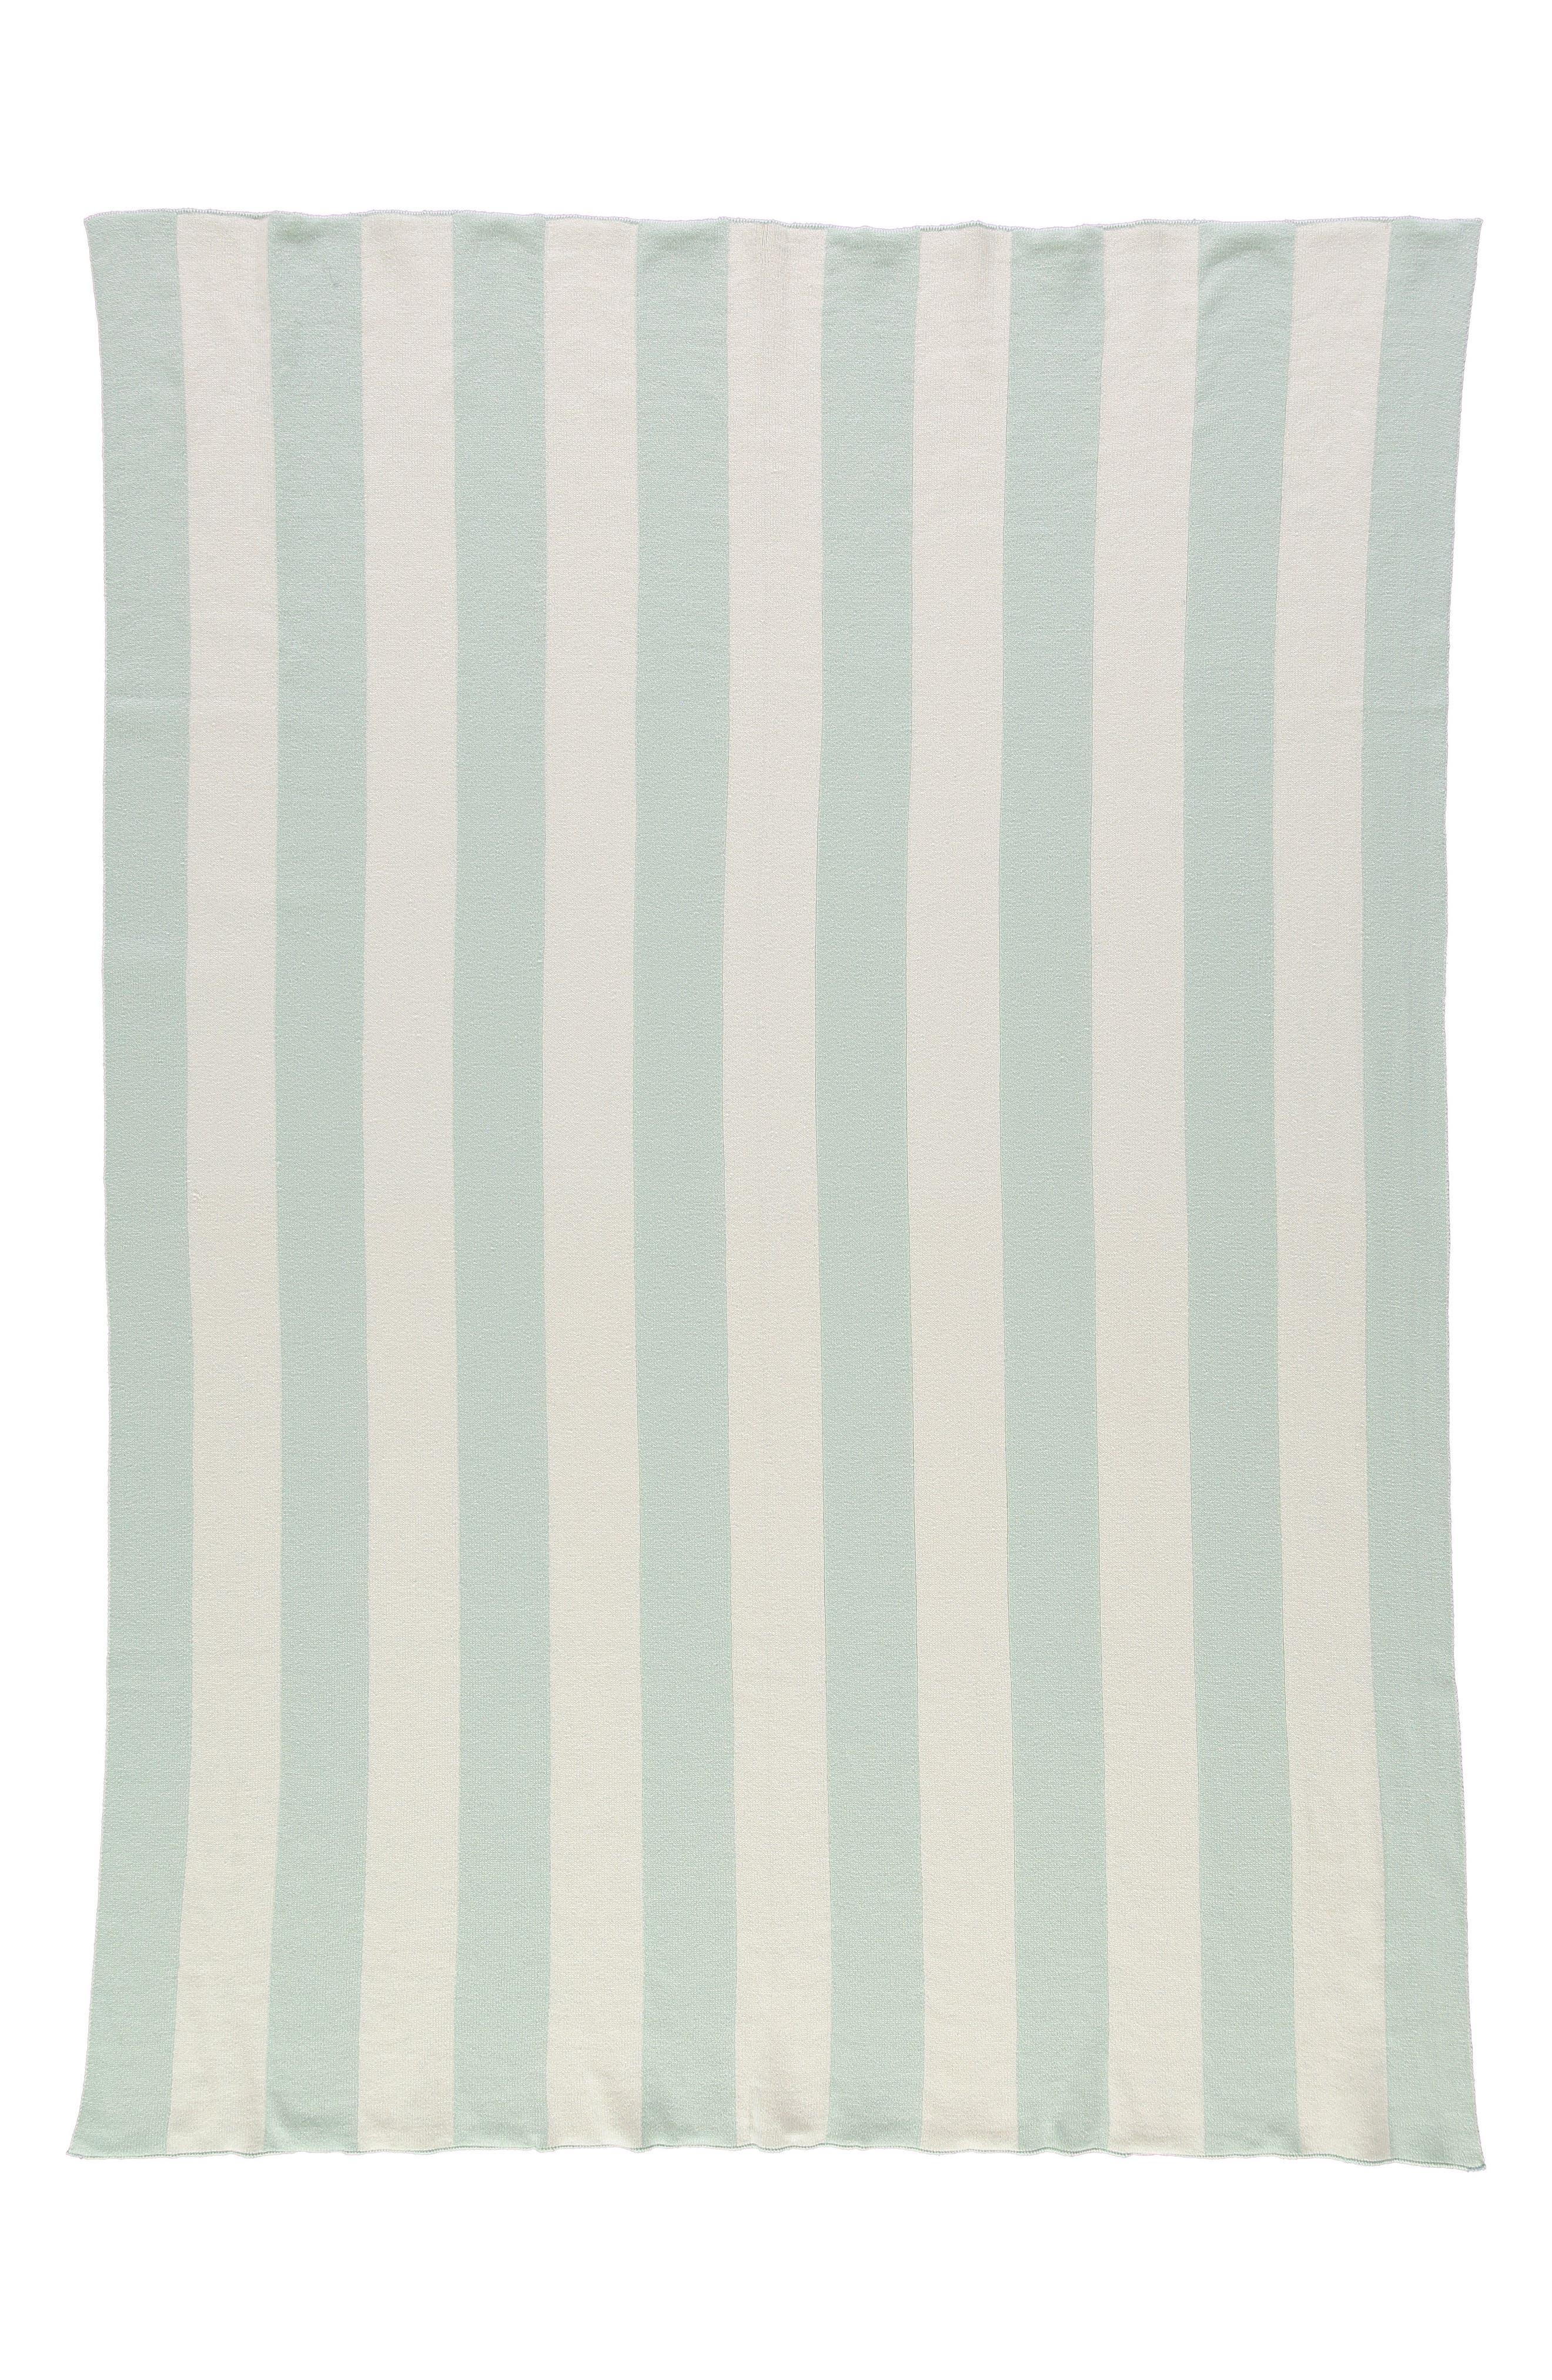 Organic Cotton Knit Blanket,                             Alternate thumbnail 2, color,                             MINT